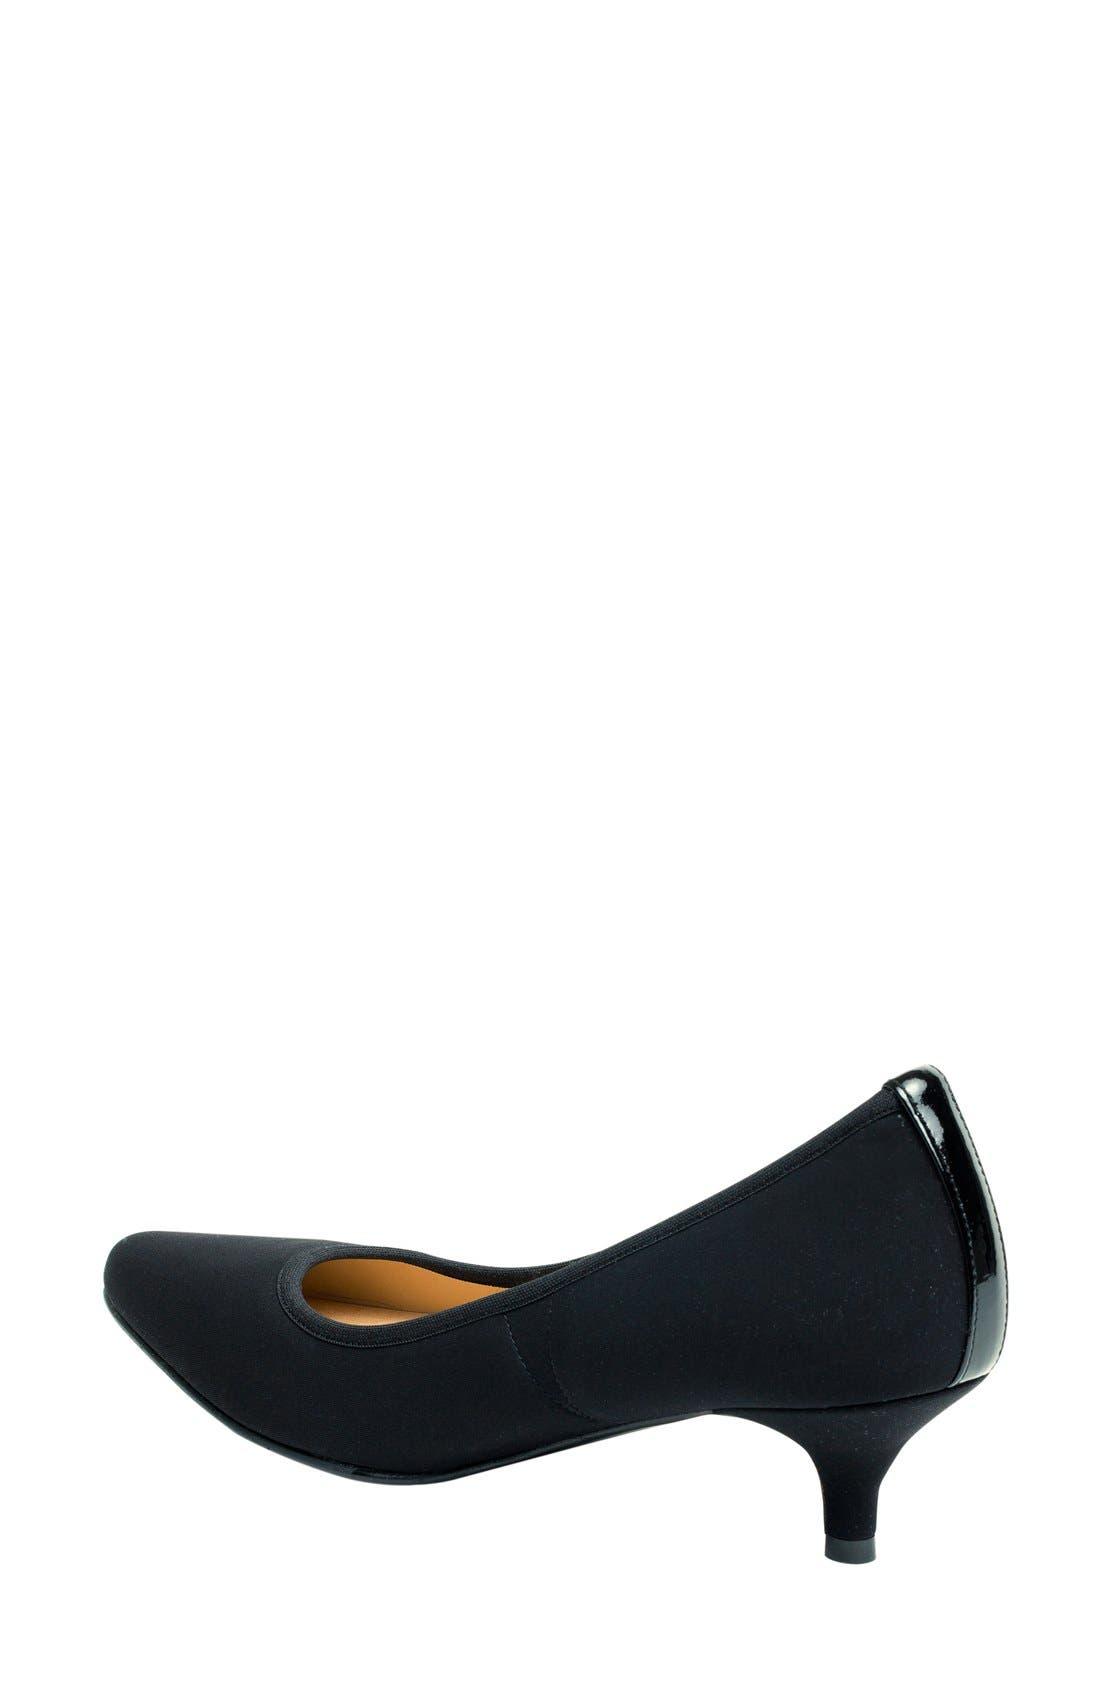 Phyllis Kitten Heel Pump,                             Alternate thumbnail 2, color,                             Black Fabric